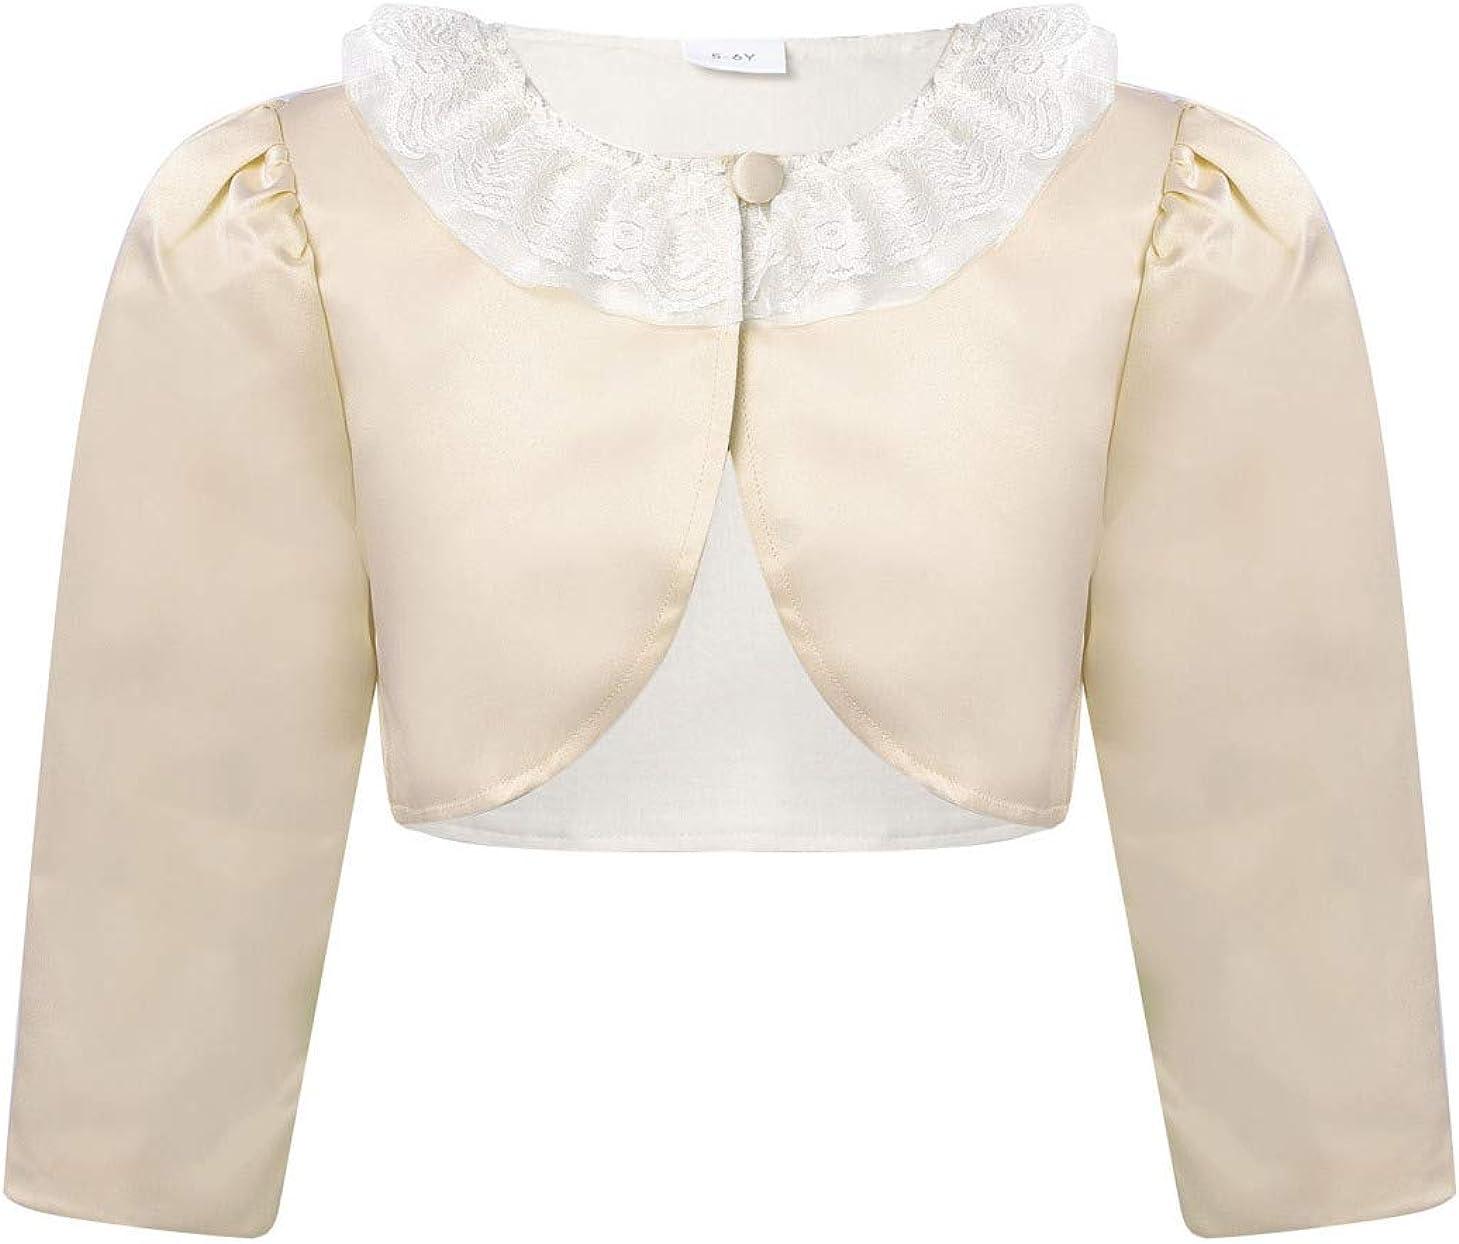 Hularka Kids Girls Bowknot Knitt Cardigan Long Sleeve Open Front Bolero Shrug Jacket